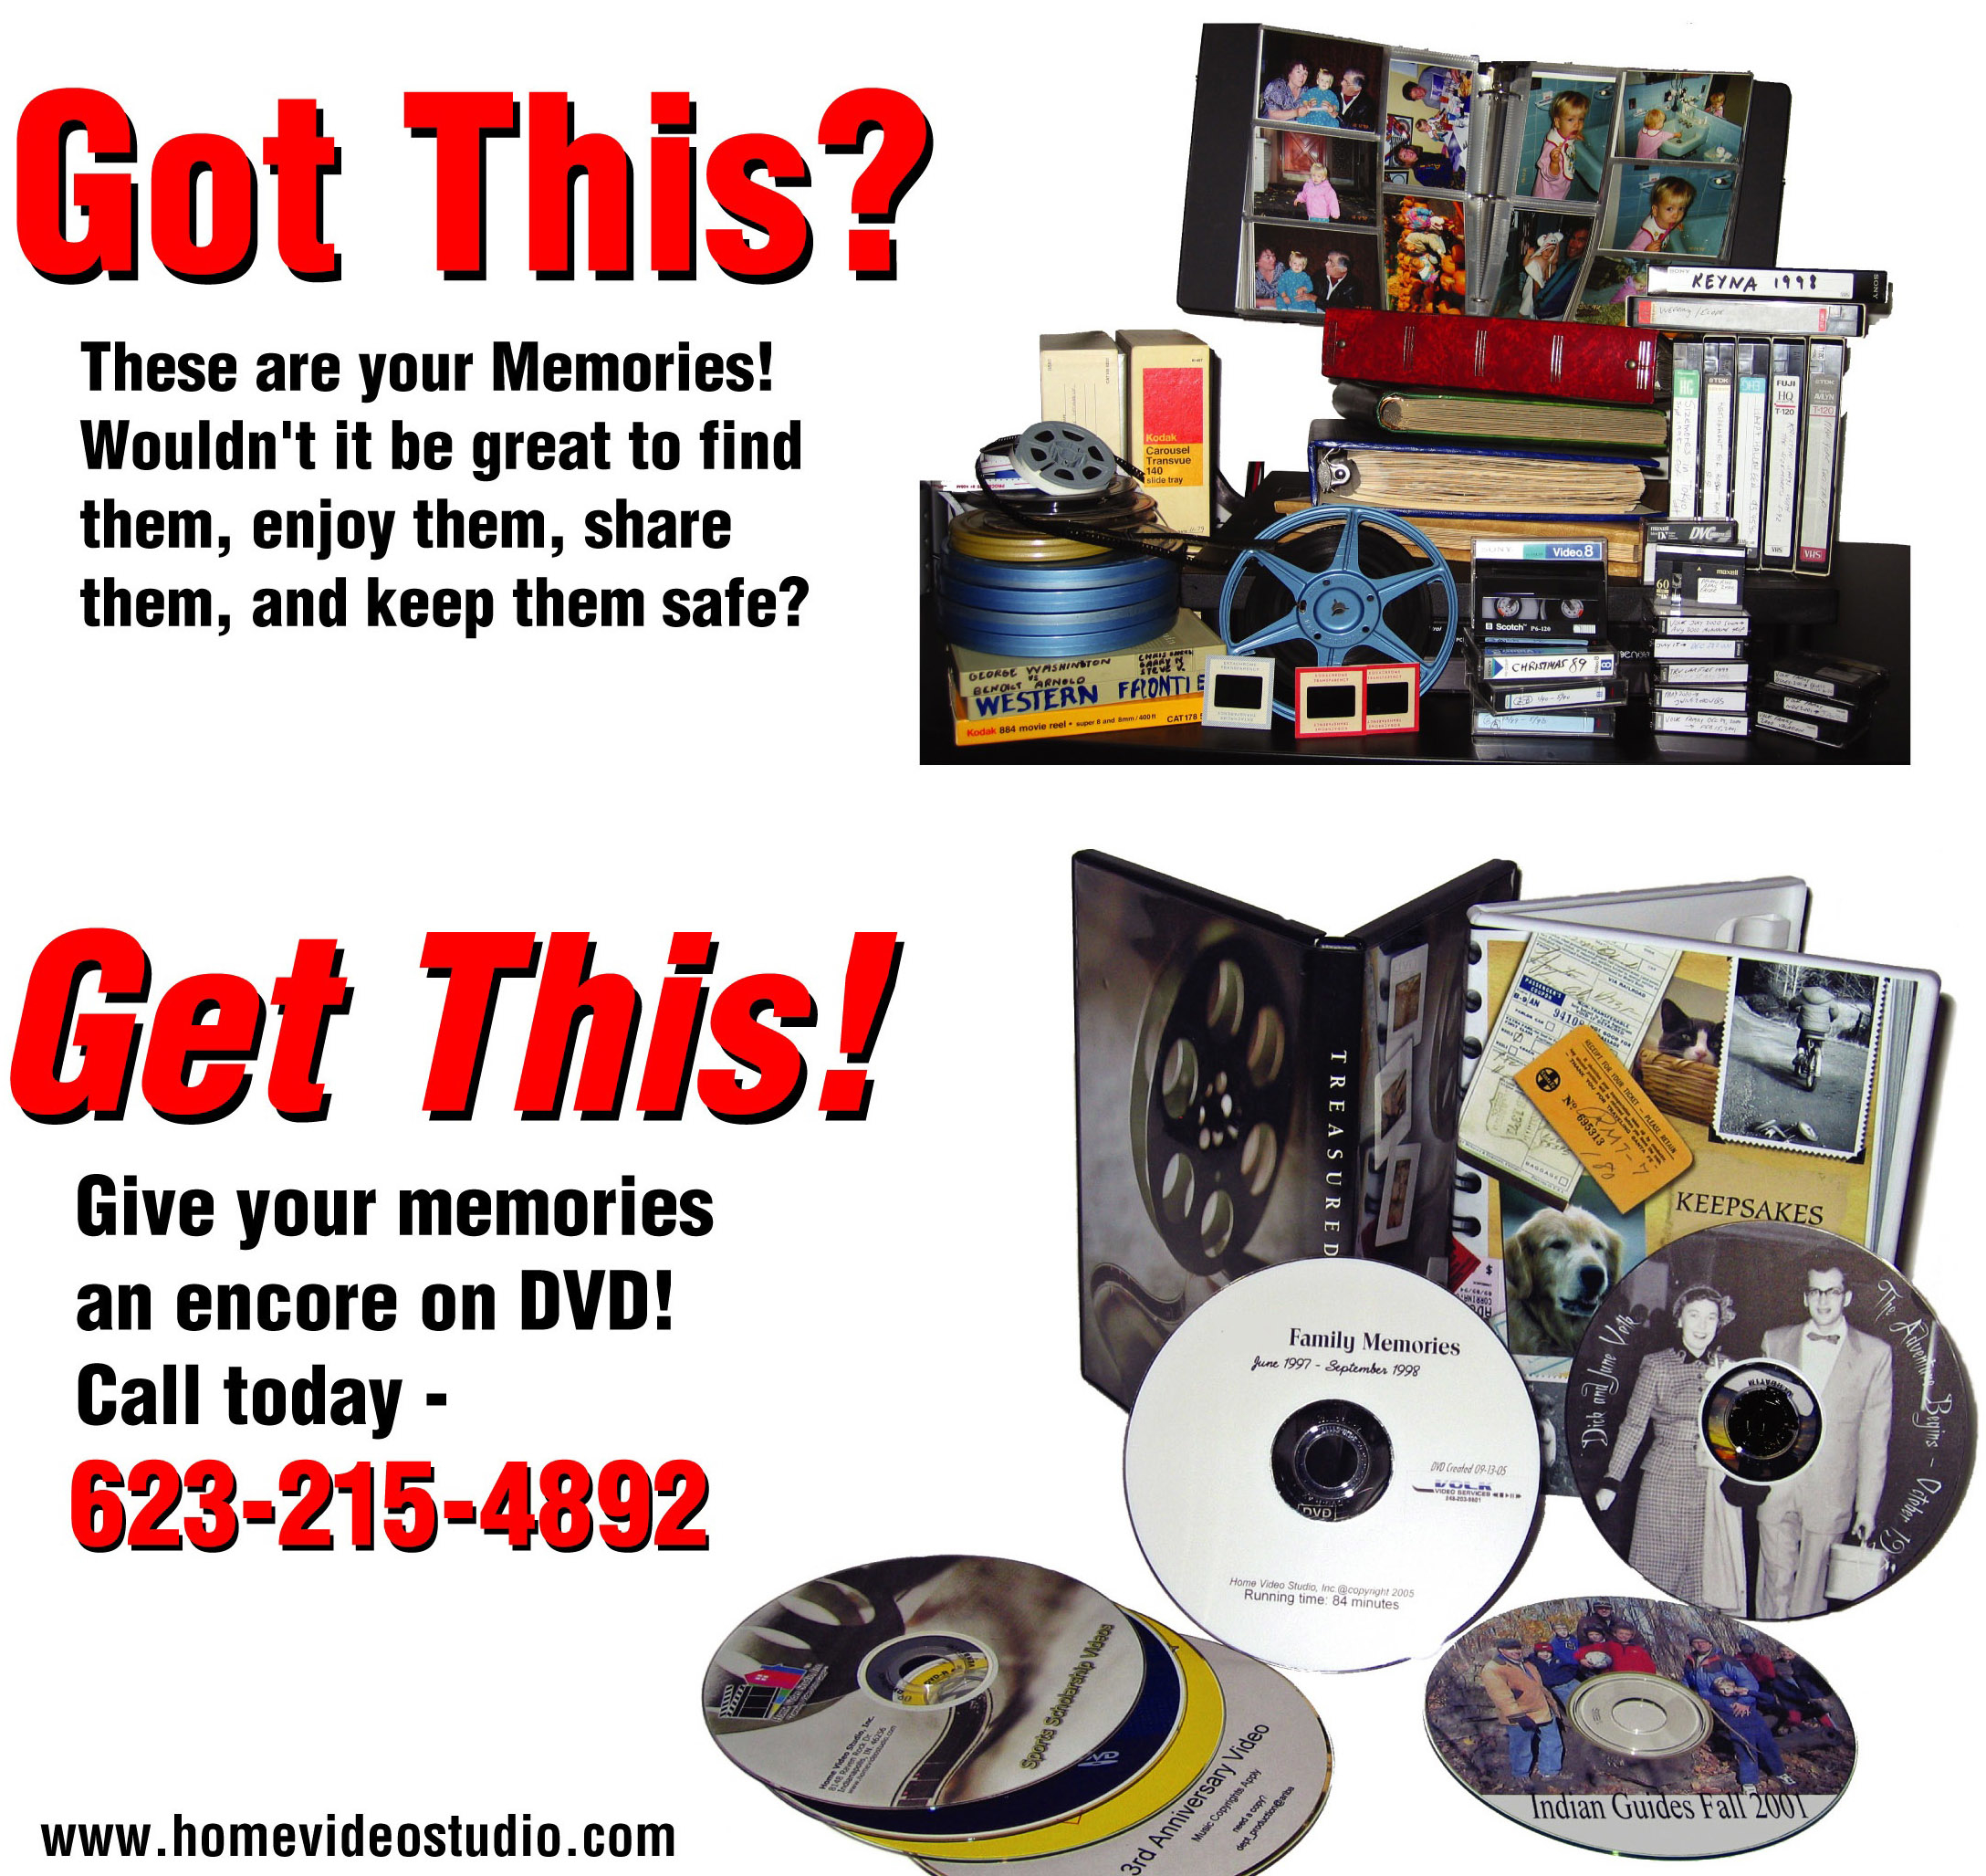 Home Video Studio Coupons Glendale AZ near me | 8coupons